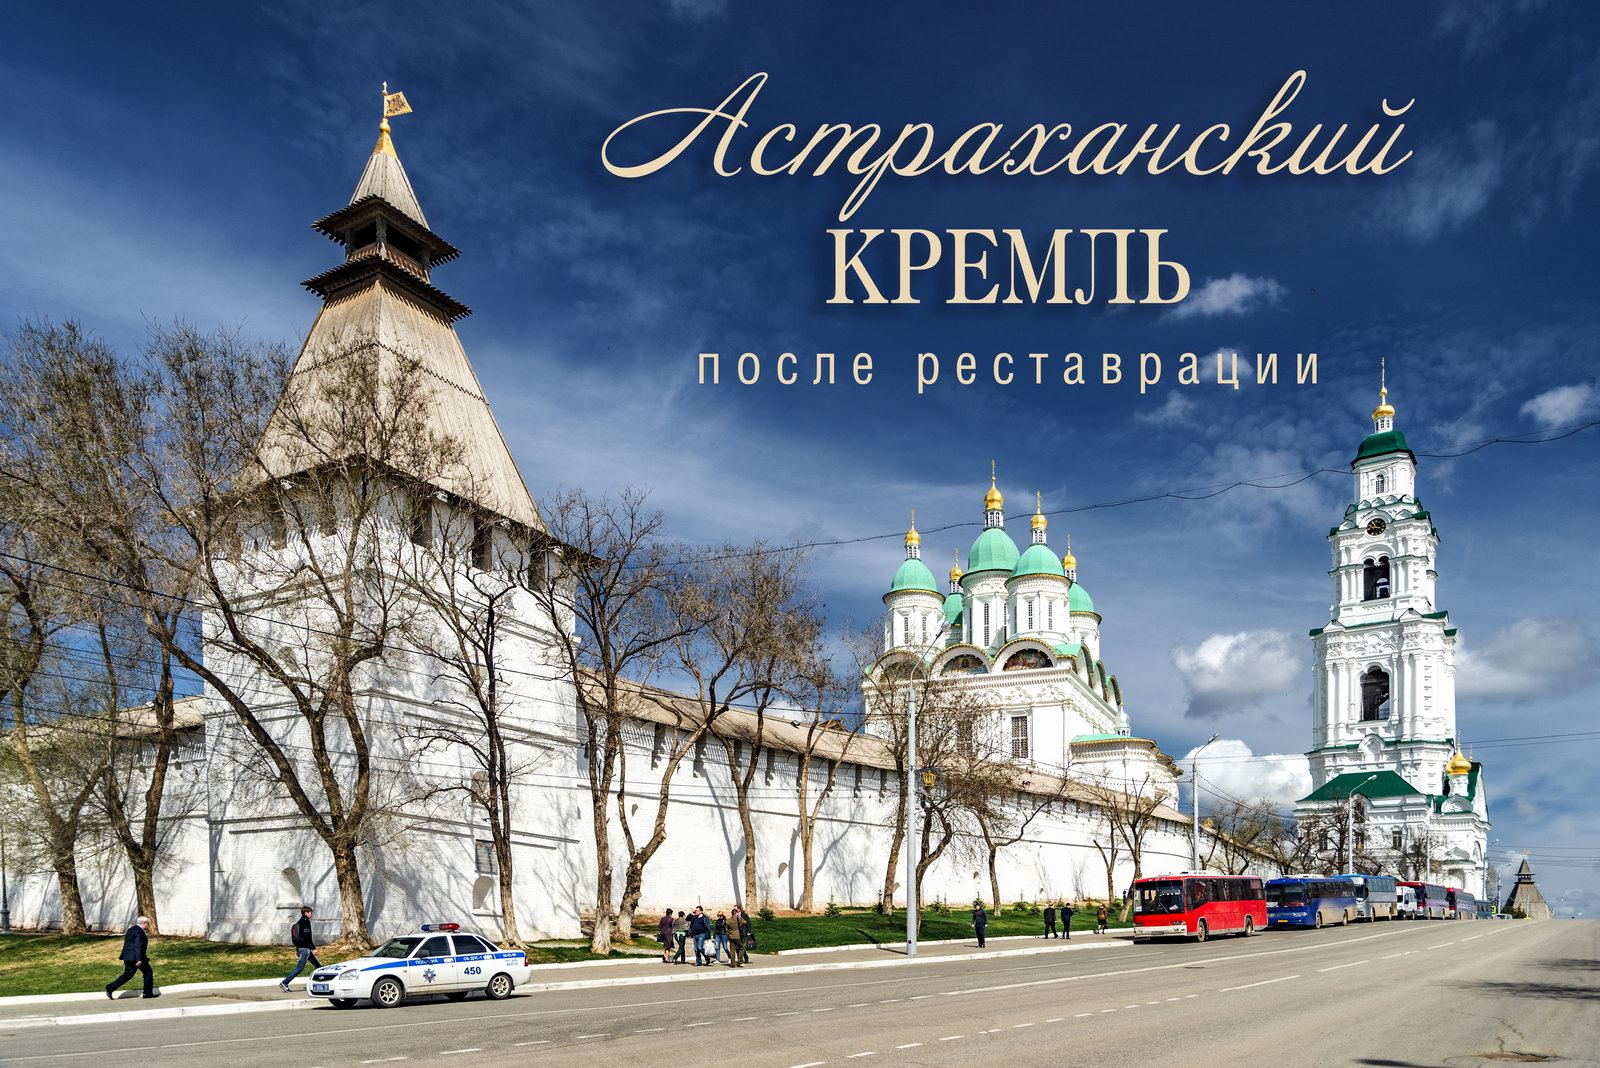 Where is Astrakhan 79